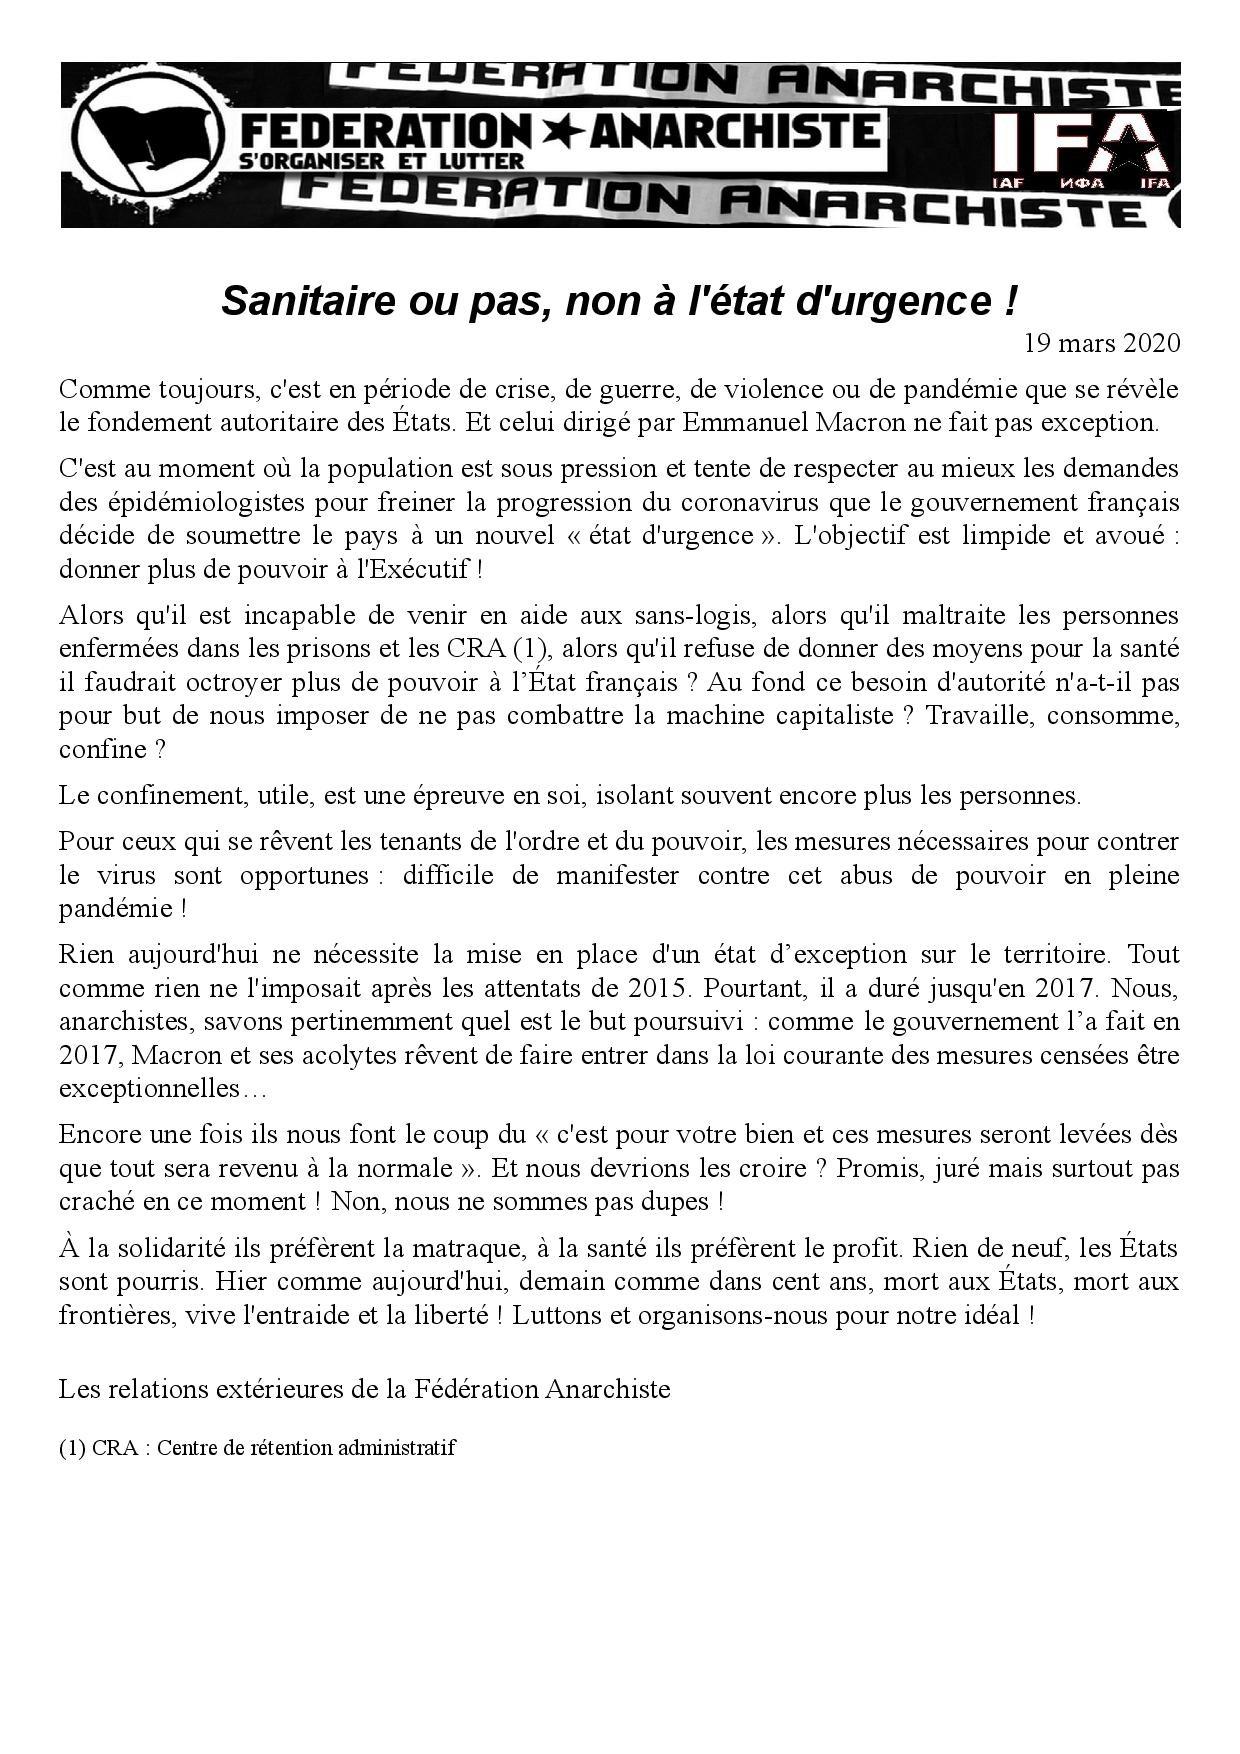 20200319_Comuniquee_FA_Sanitaire_ou_pas_non_a_lEtat_durgence.jpg